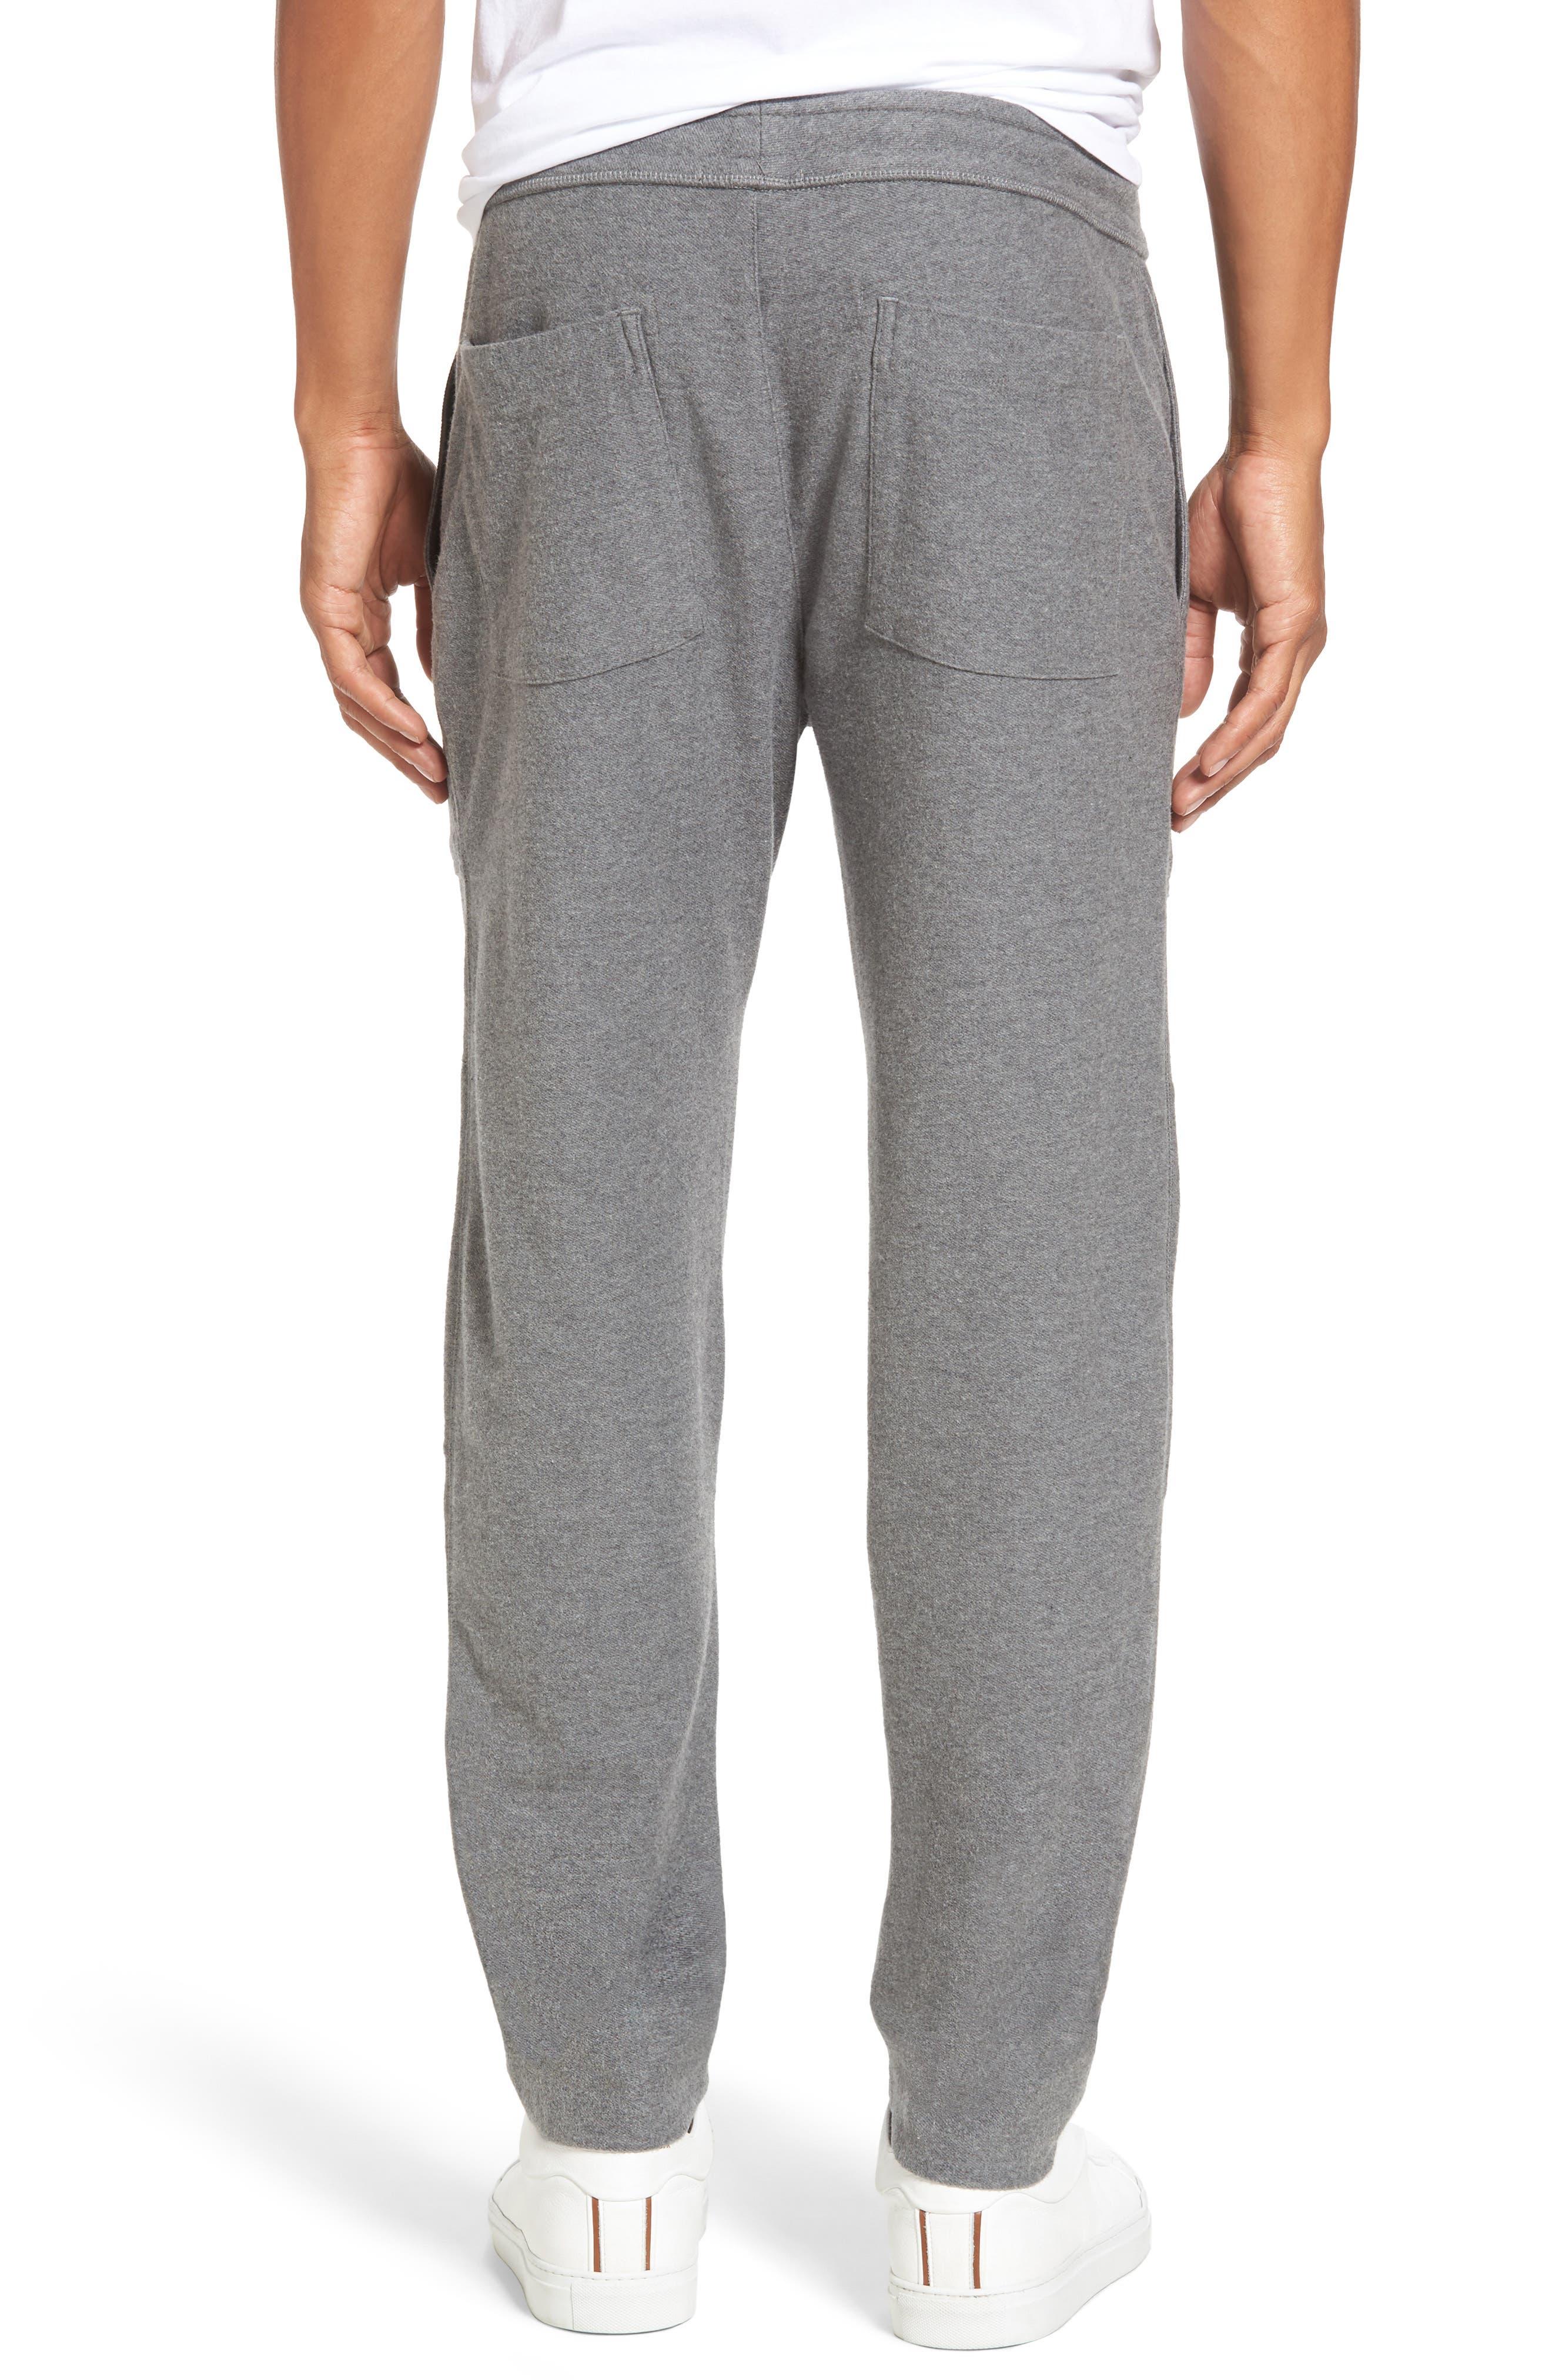 Heathered Knit Lounge Pants,                             Alternate thumbnail 2, color,                             086